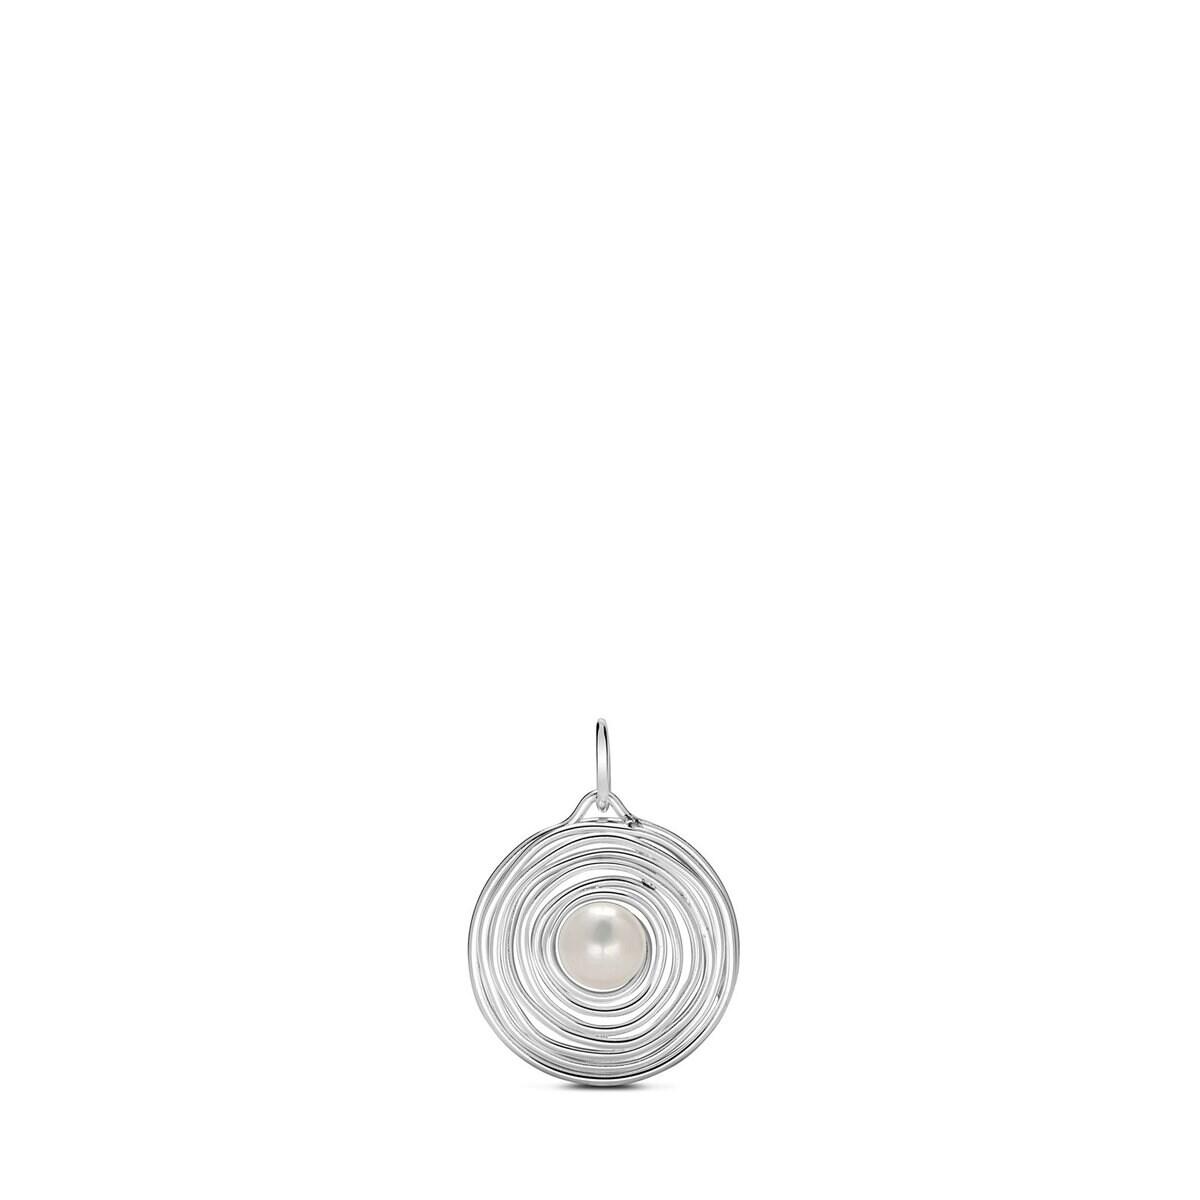 Silver Niu Pendant with Pearl